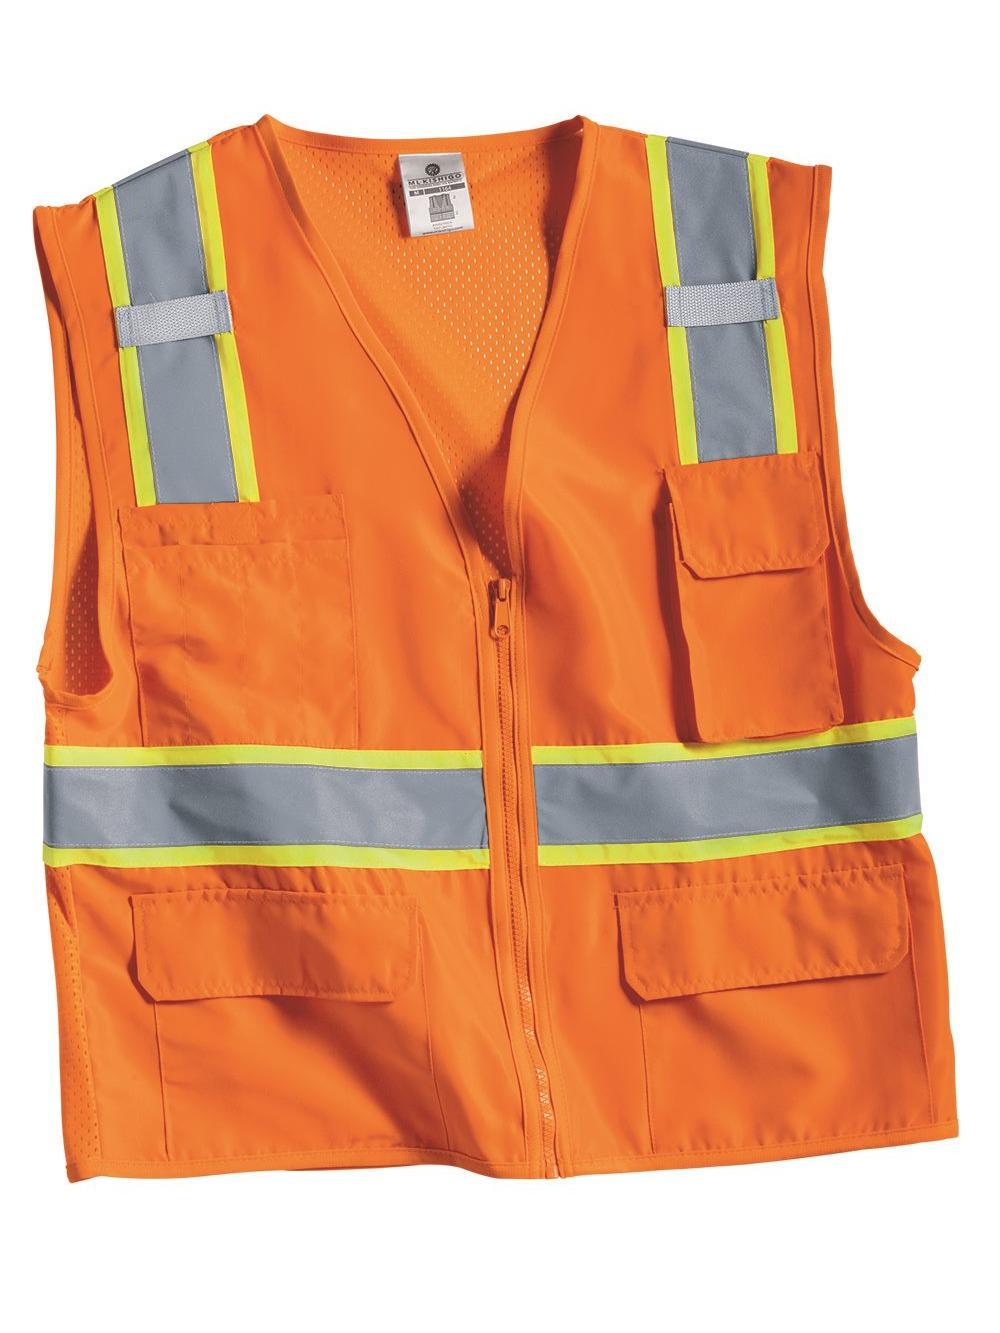 ML Kishigo Workwear Solid Front Vest with Mesh Back